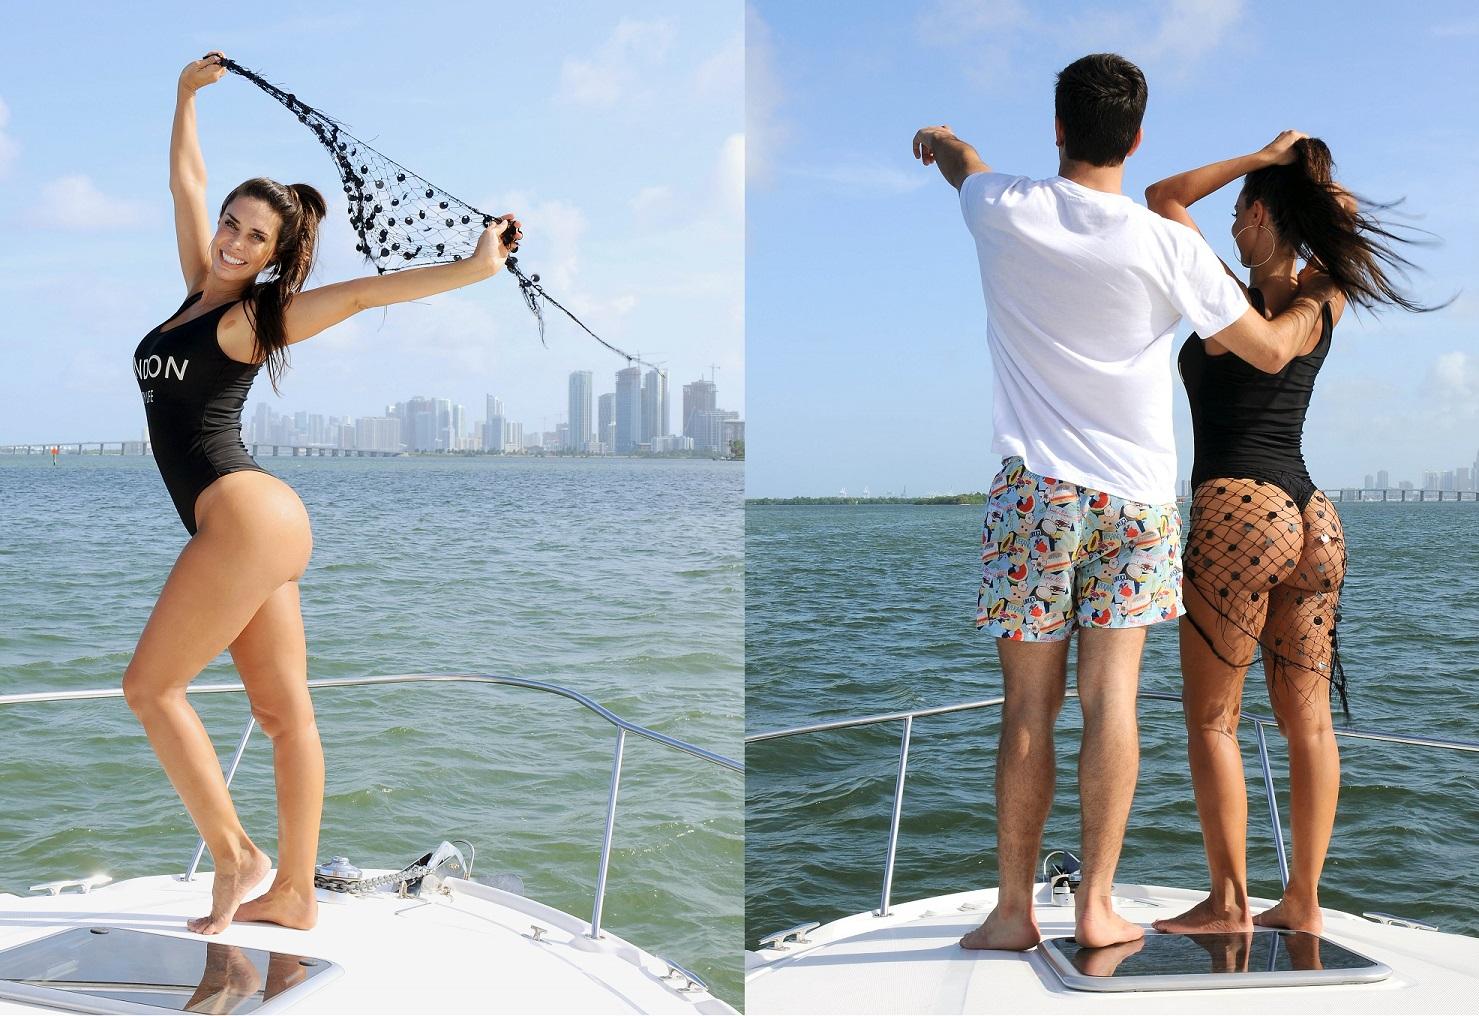 Pictures Sabrina Ravelli nudes (93 photos), Ass, Bikini, Feet, lingerie 2019